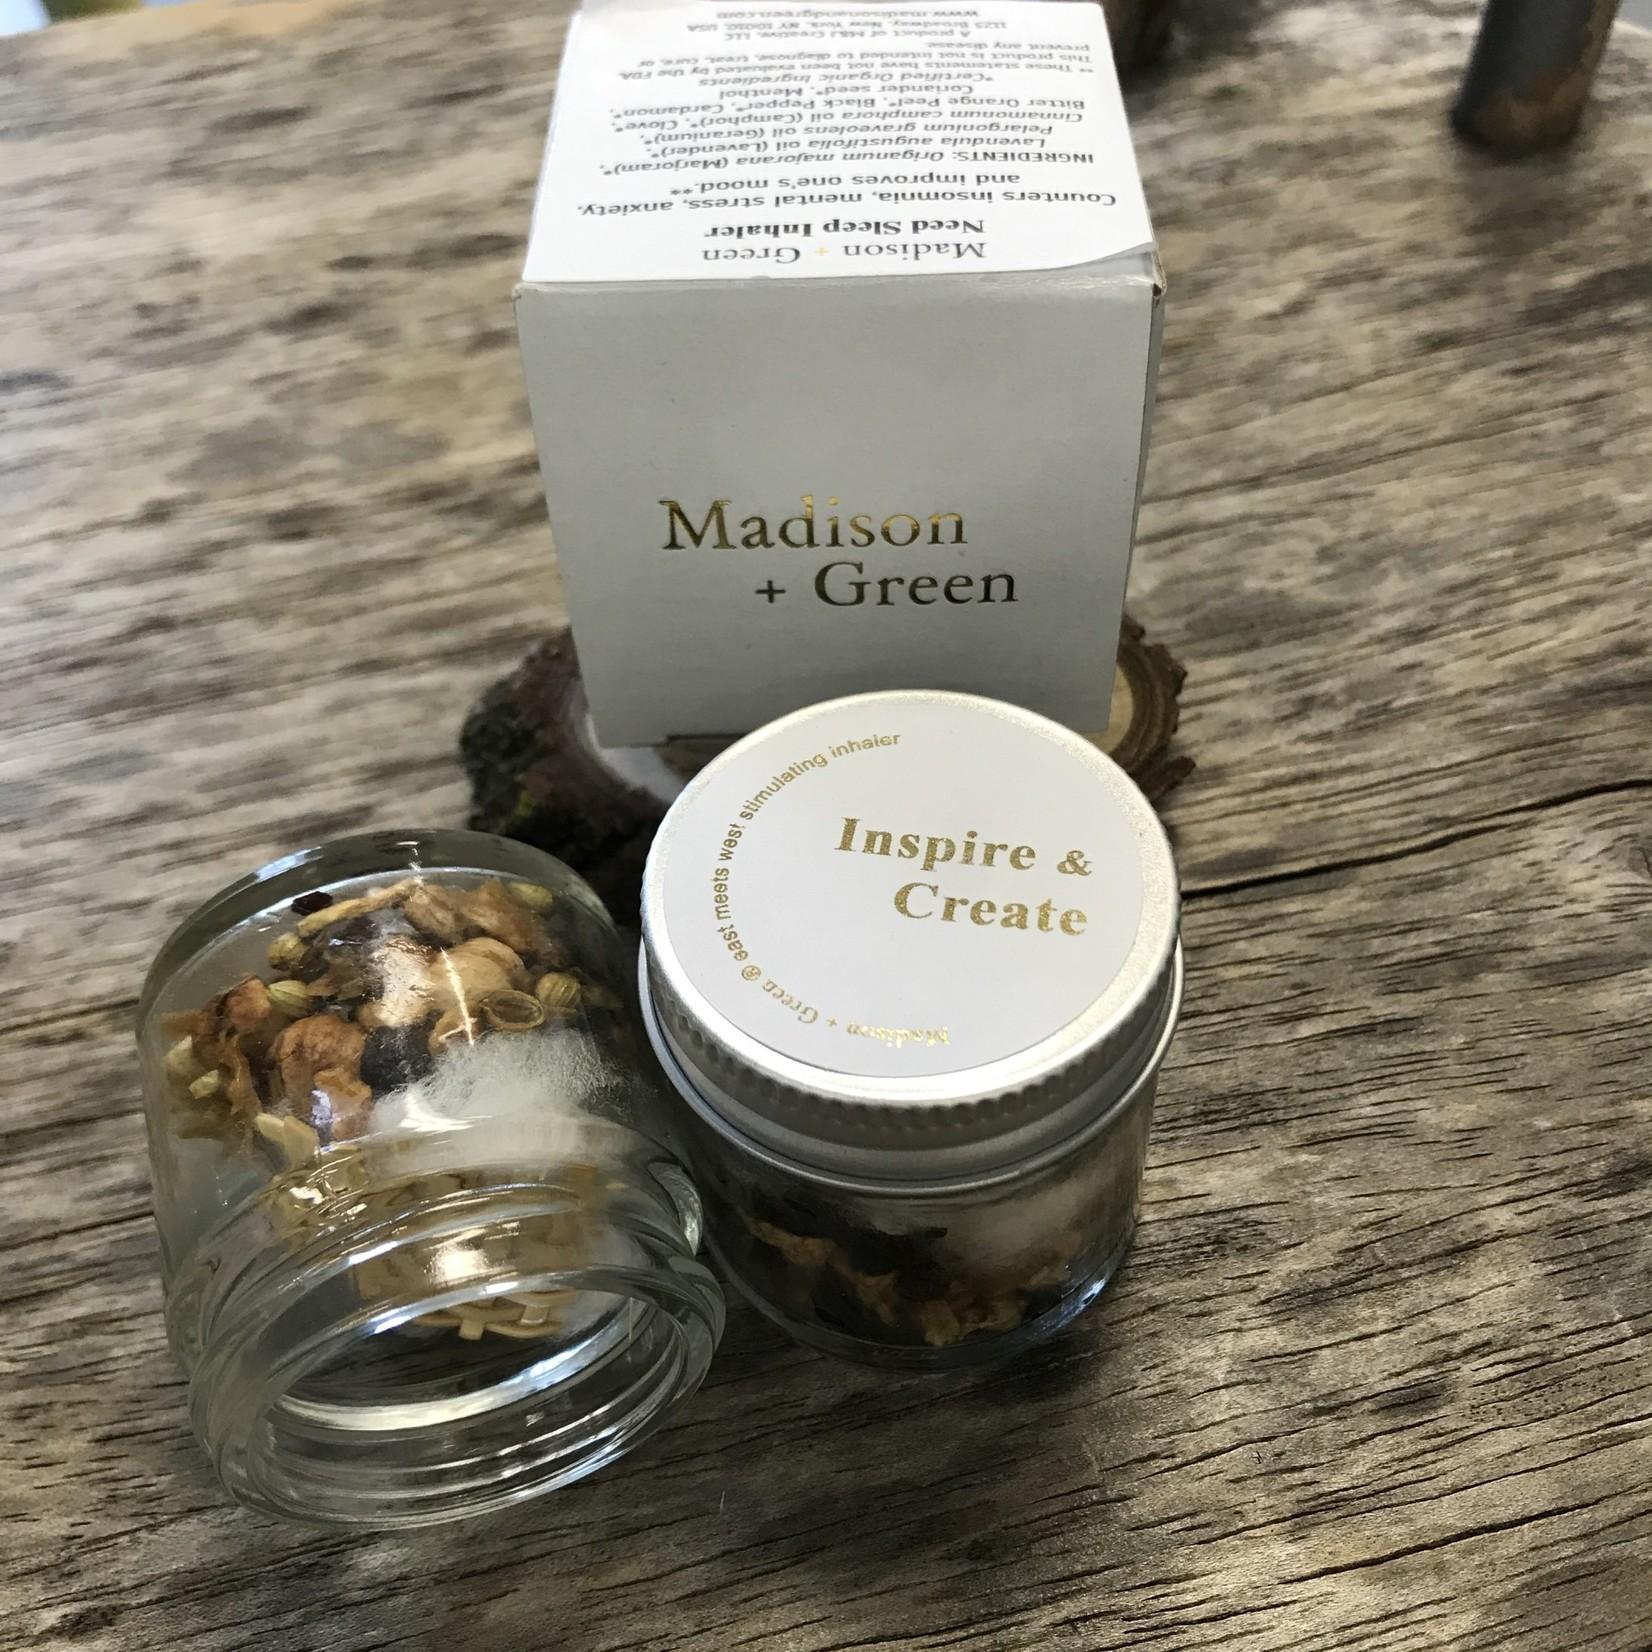 Madison & Green Madison + Green Inhaler - Need Sleep Inhaler